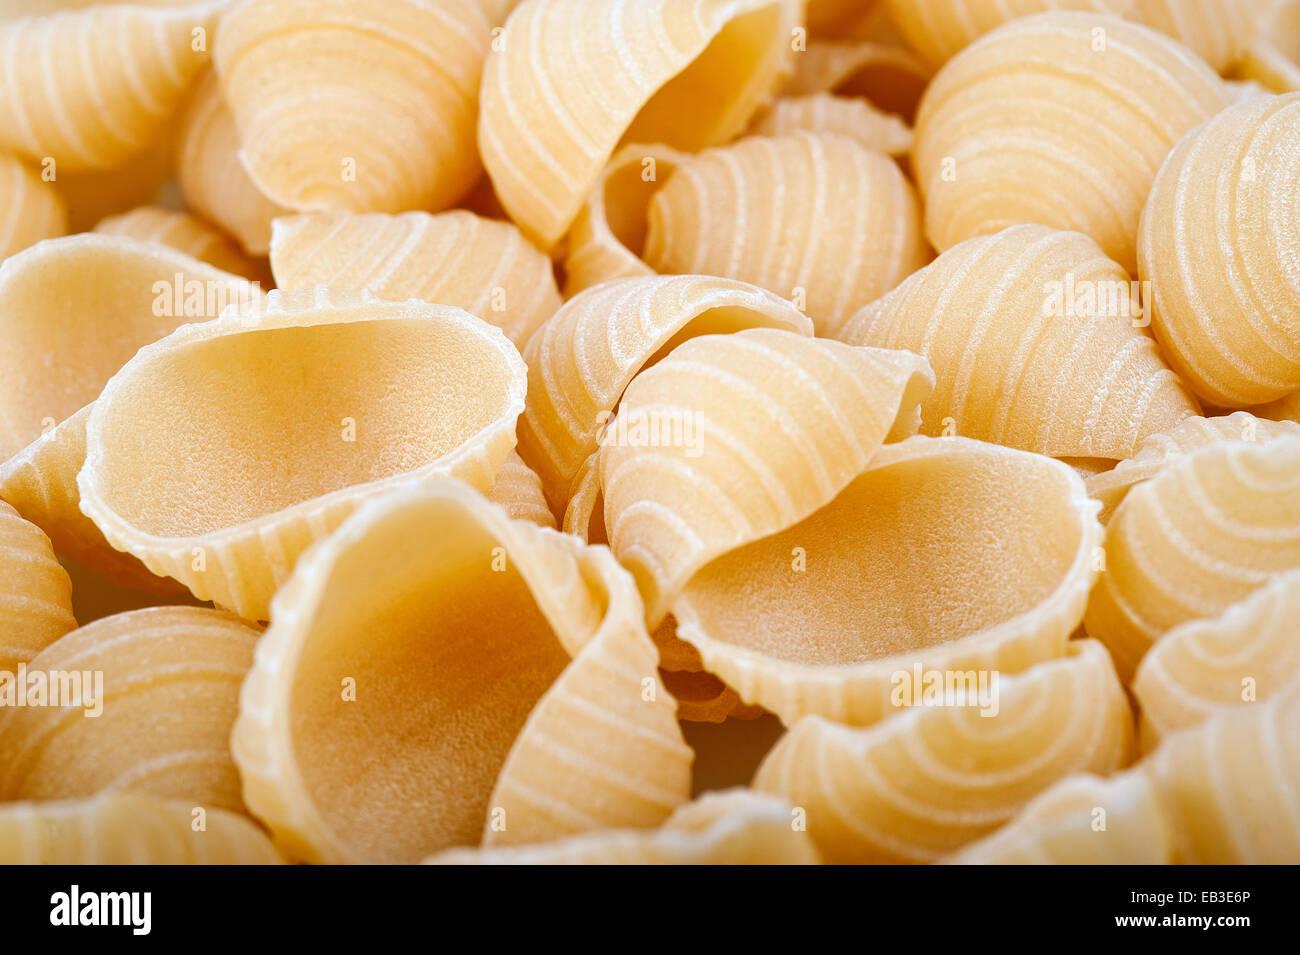 Grupo de conchiglie pasta italiana Imagen De Stock